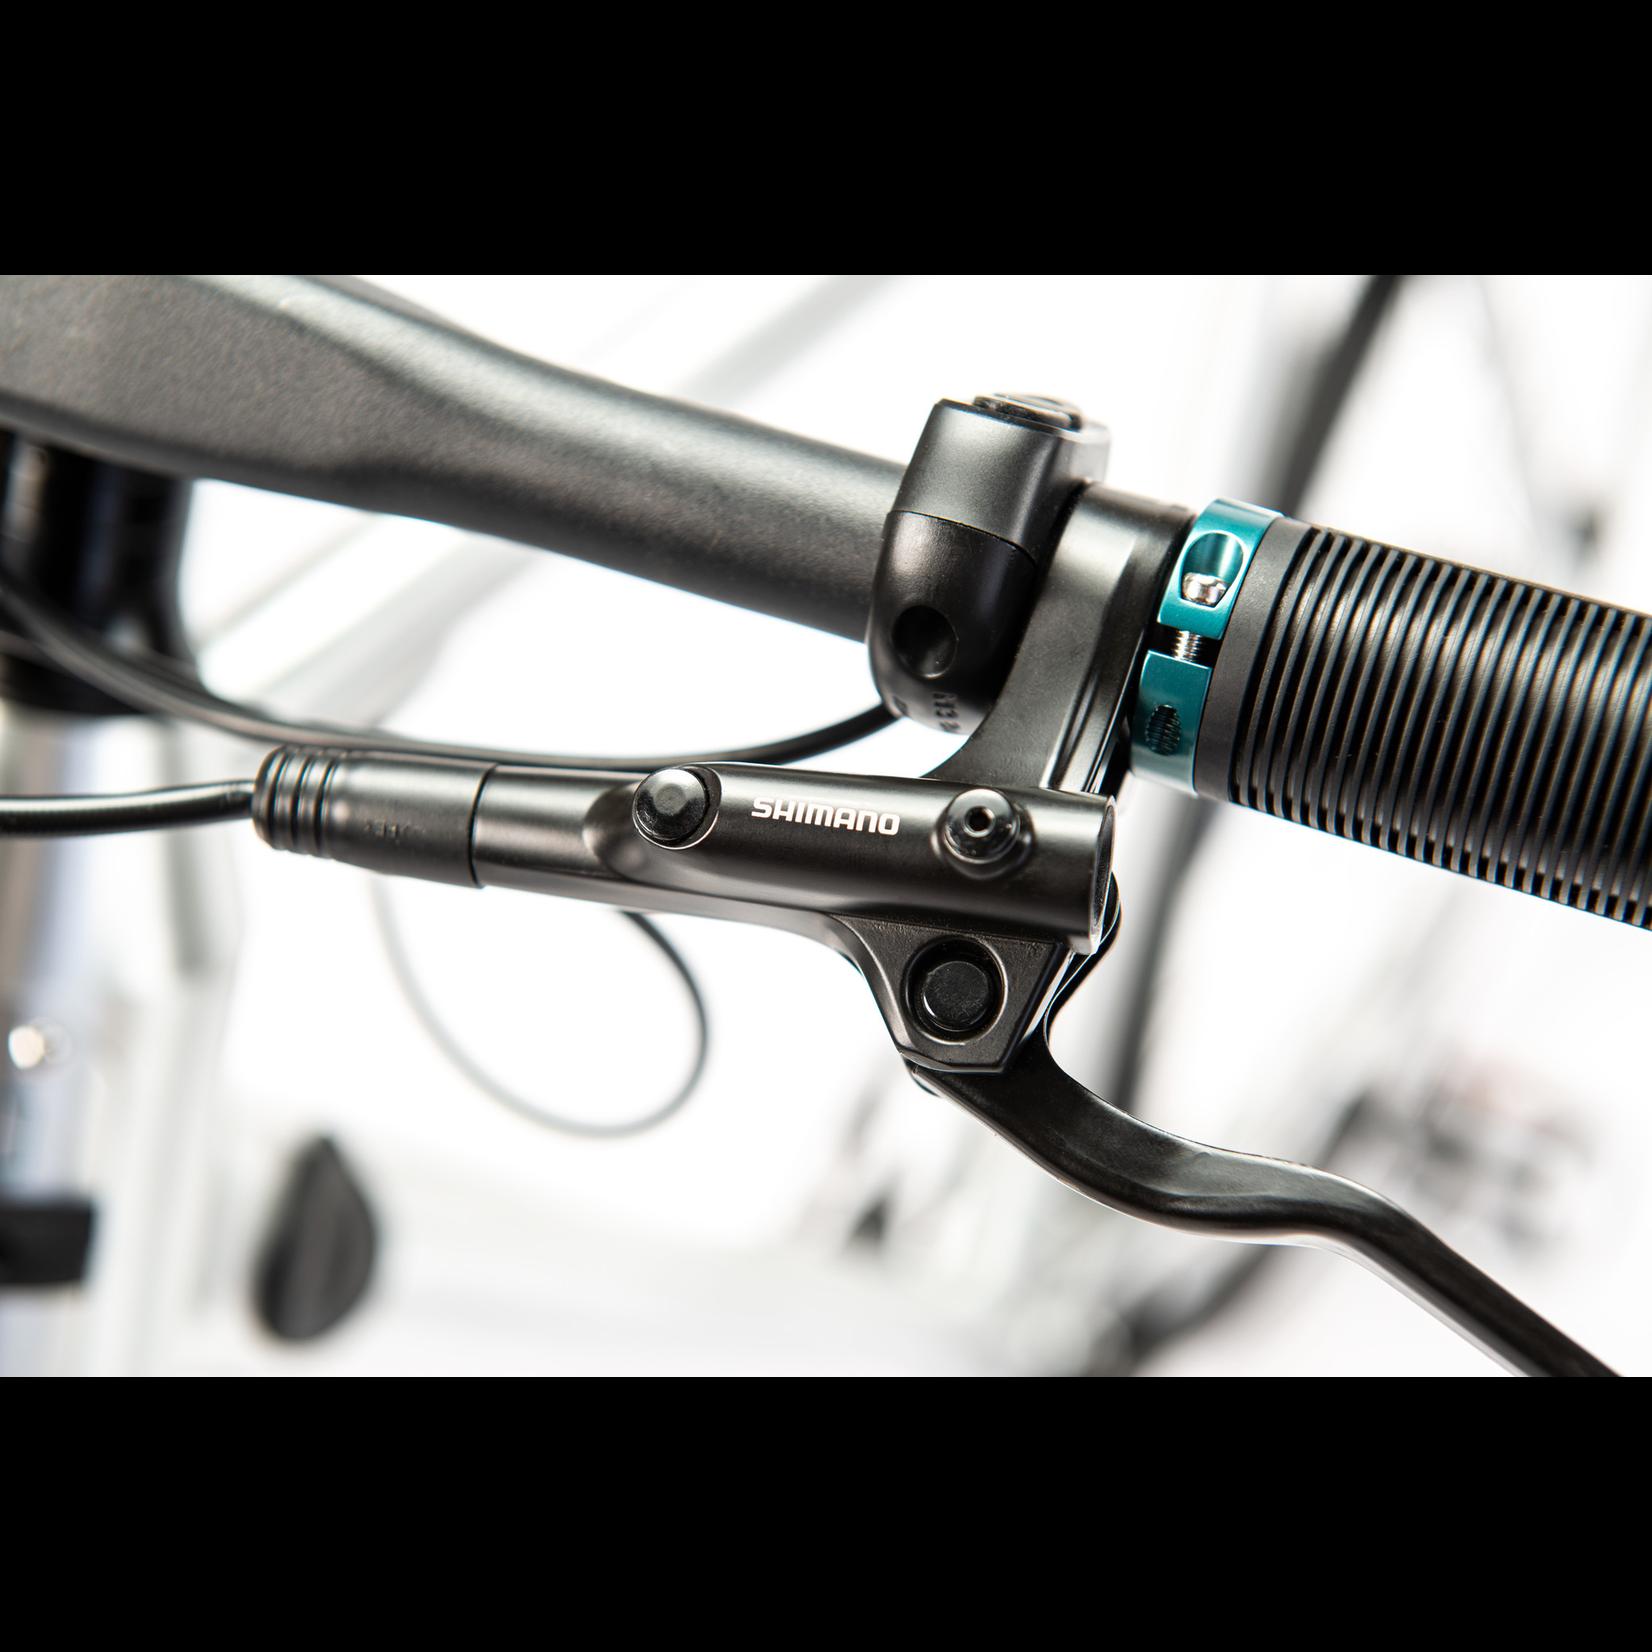 Shimano brake front hydraulic